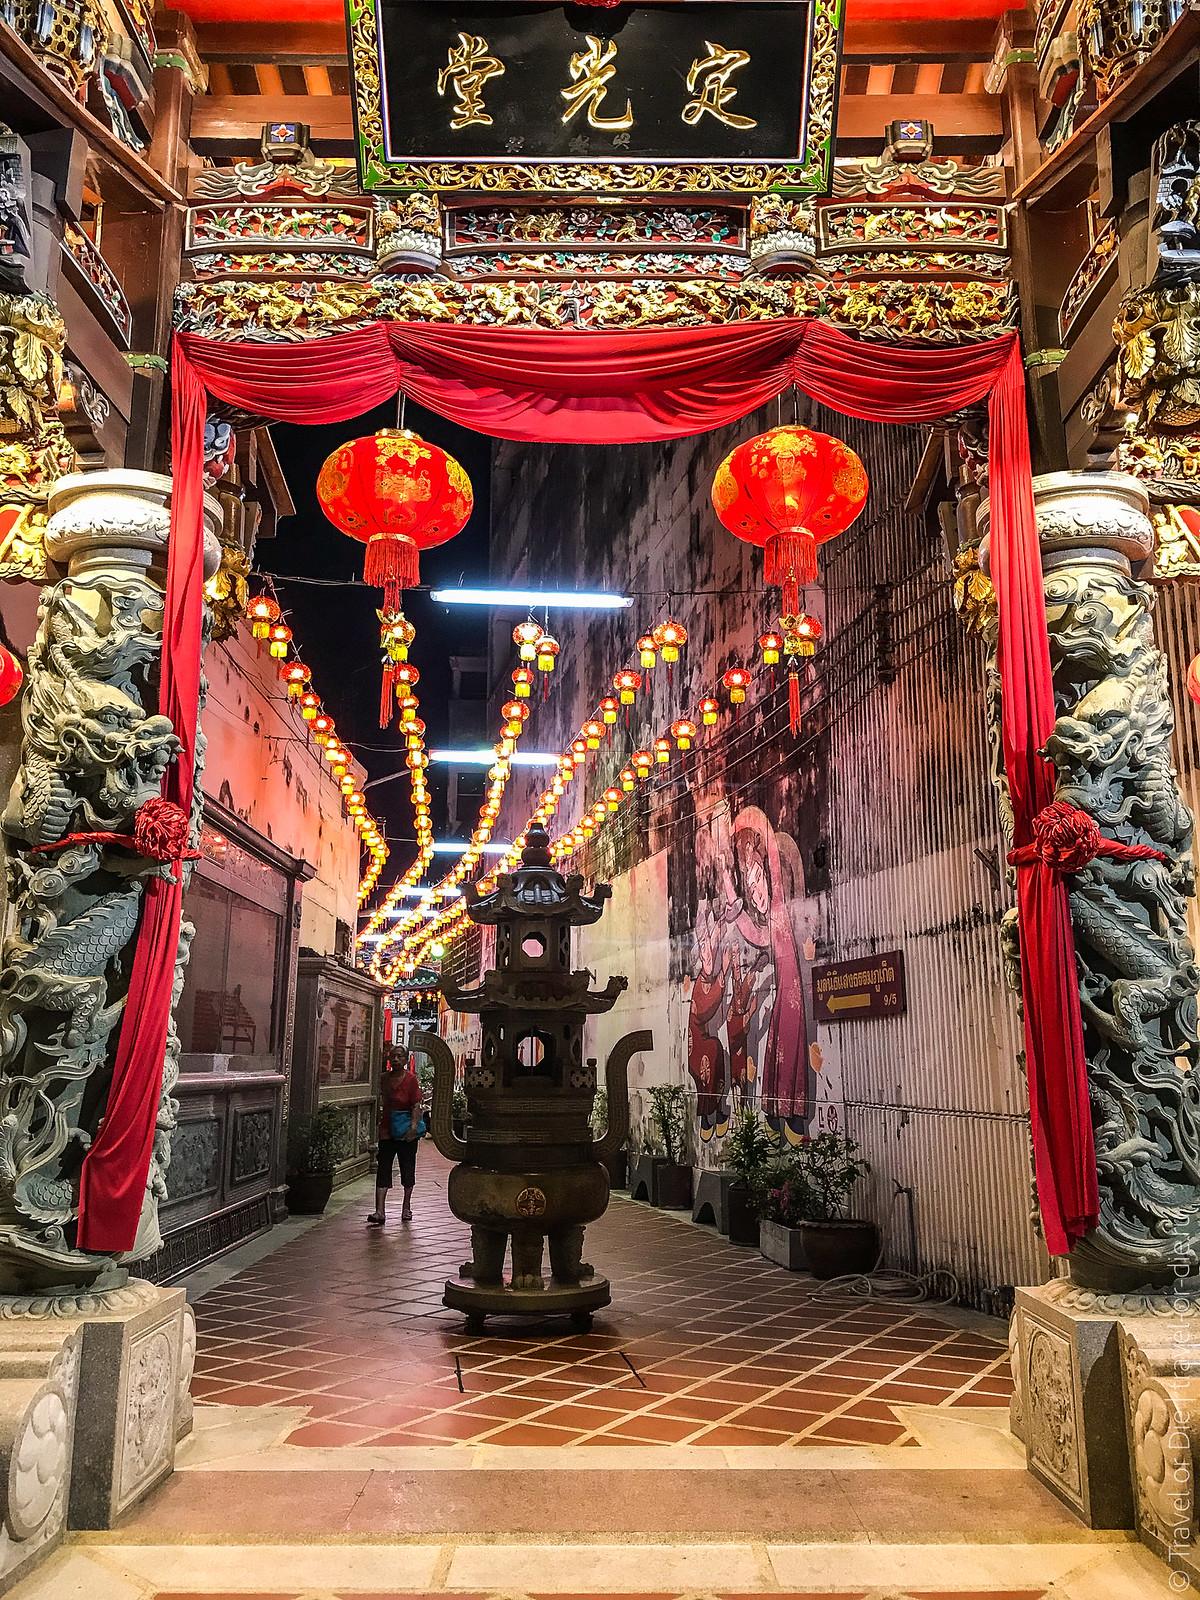 Phuket-Town-Old-Town-Thailand-8034